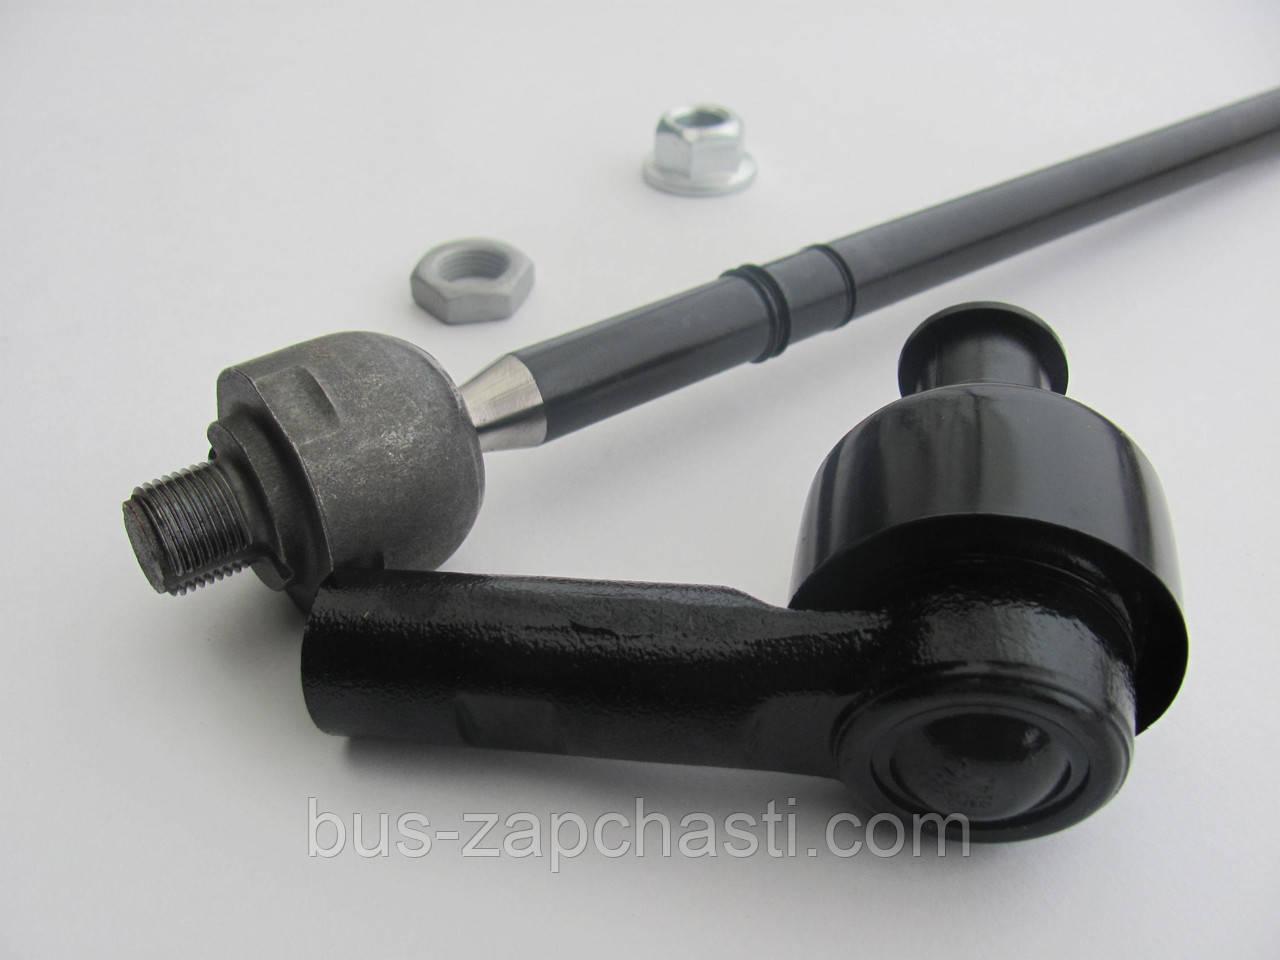 Рулевая тяга + наконечник на MB Sprinter 906, VW Crafter 2006→ — TRW (Европа) — JRA541